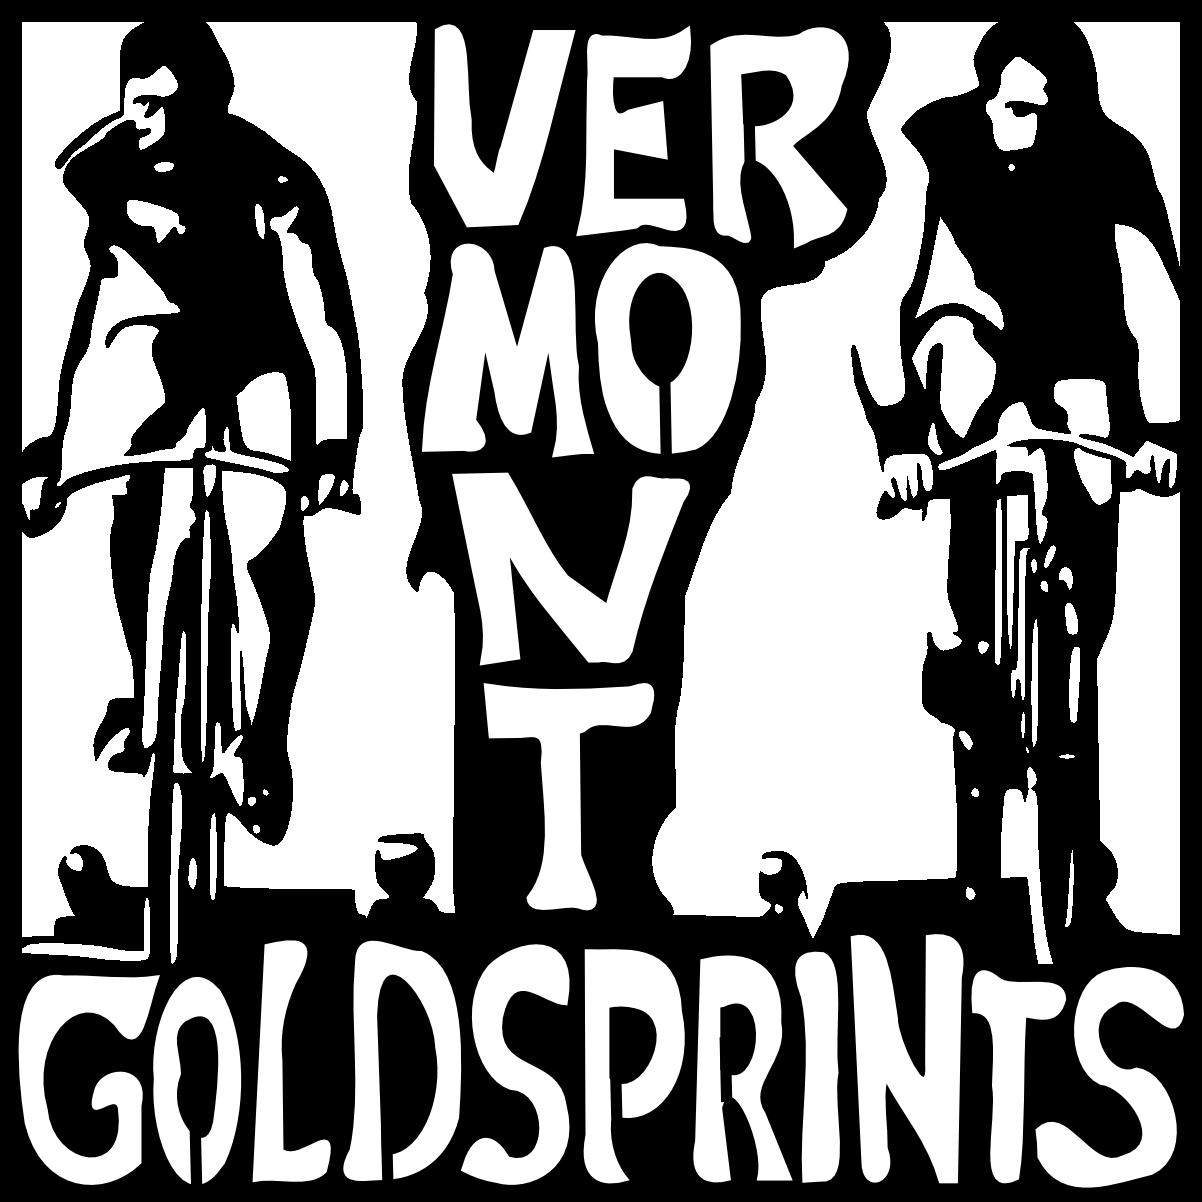 vtgoldsprints2015-stencil2.png